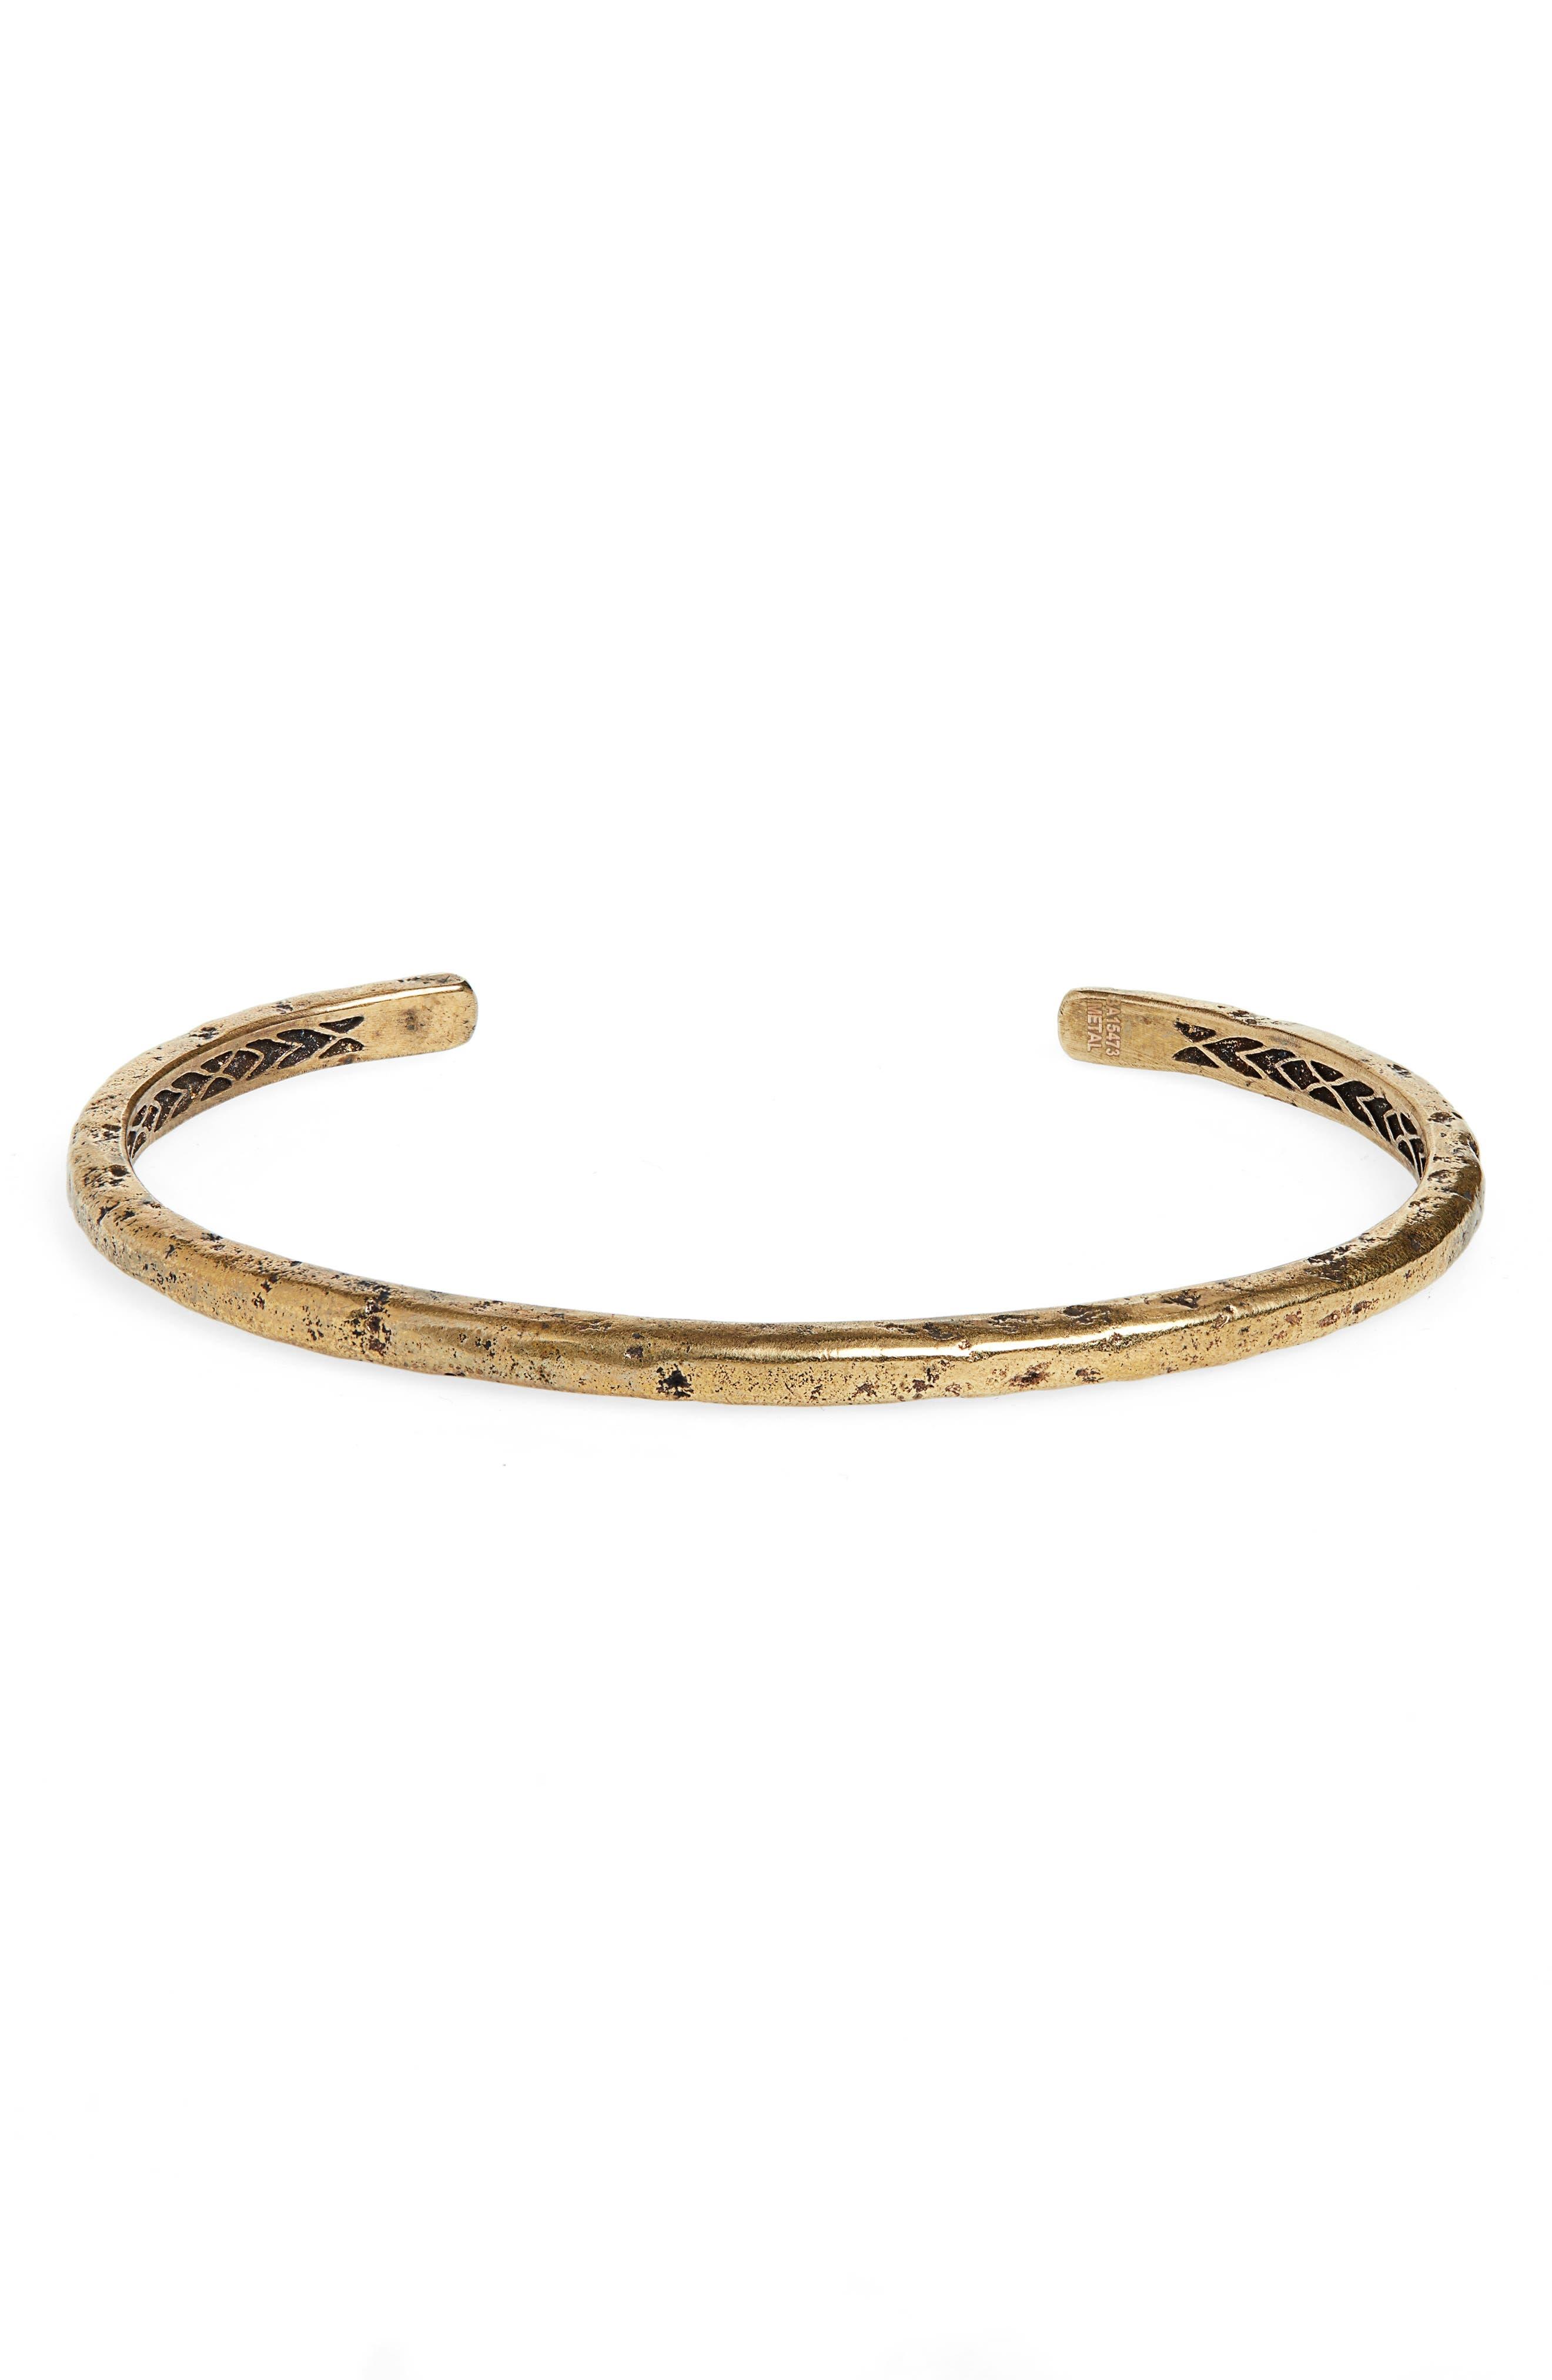 Distressed Brass Cuff Bracelet